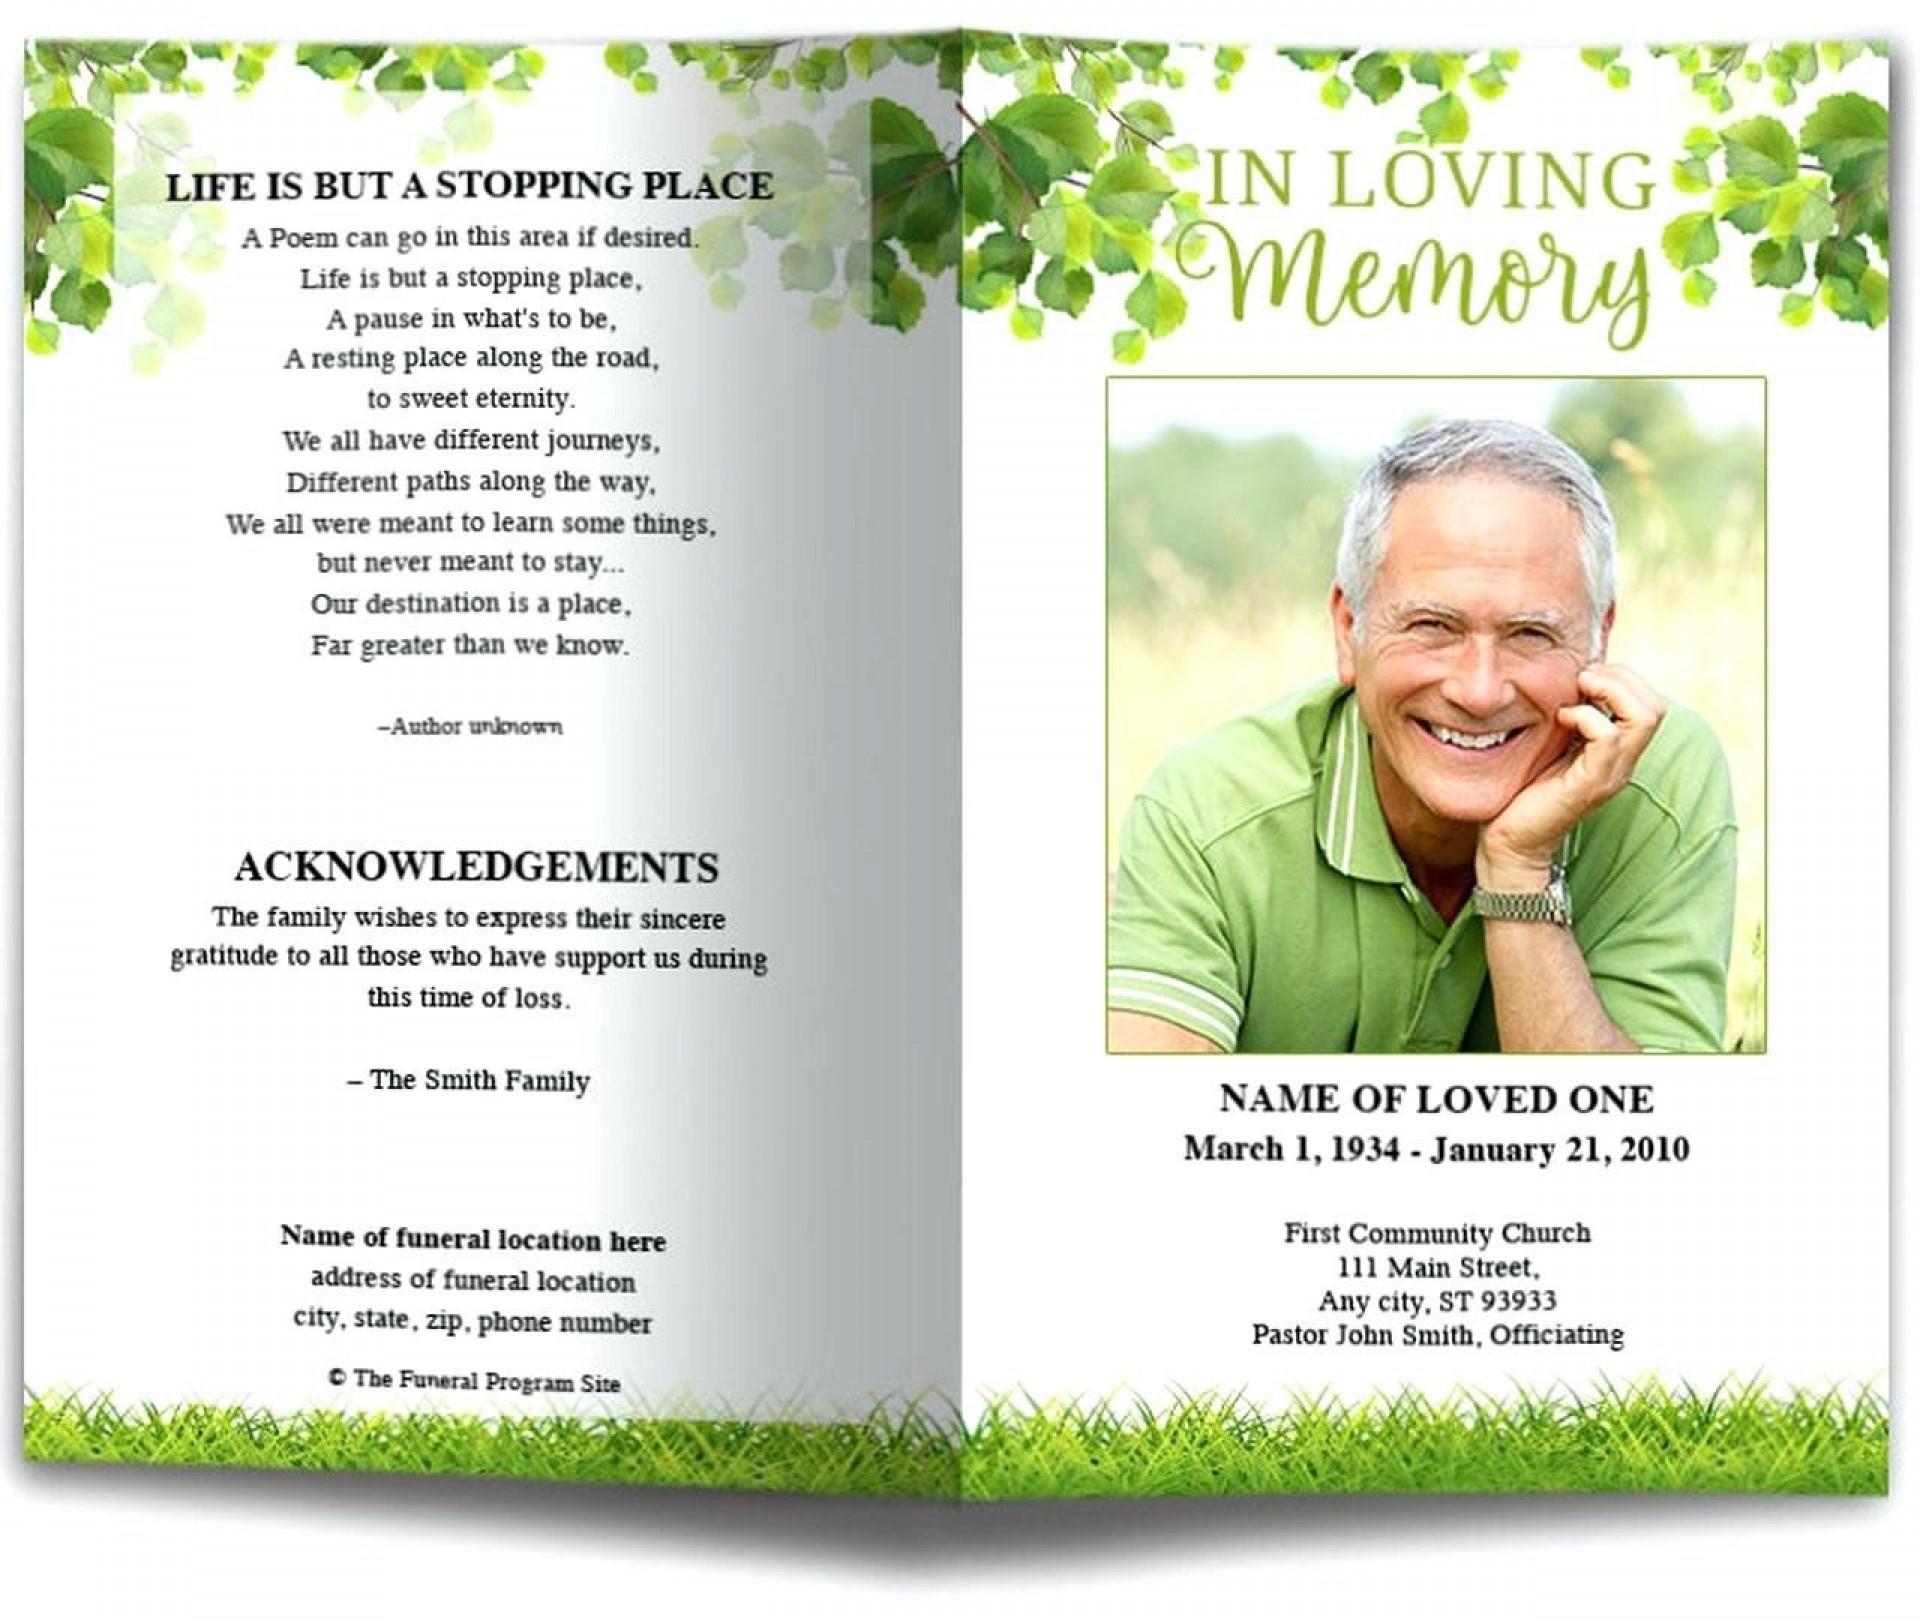 010 Incredible Free Funeral Program Template High Definition  Word Catholic Editable Pdf1920